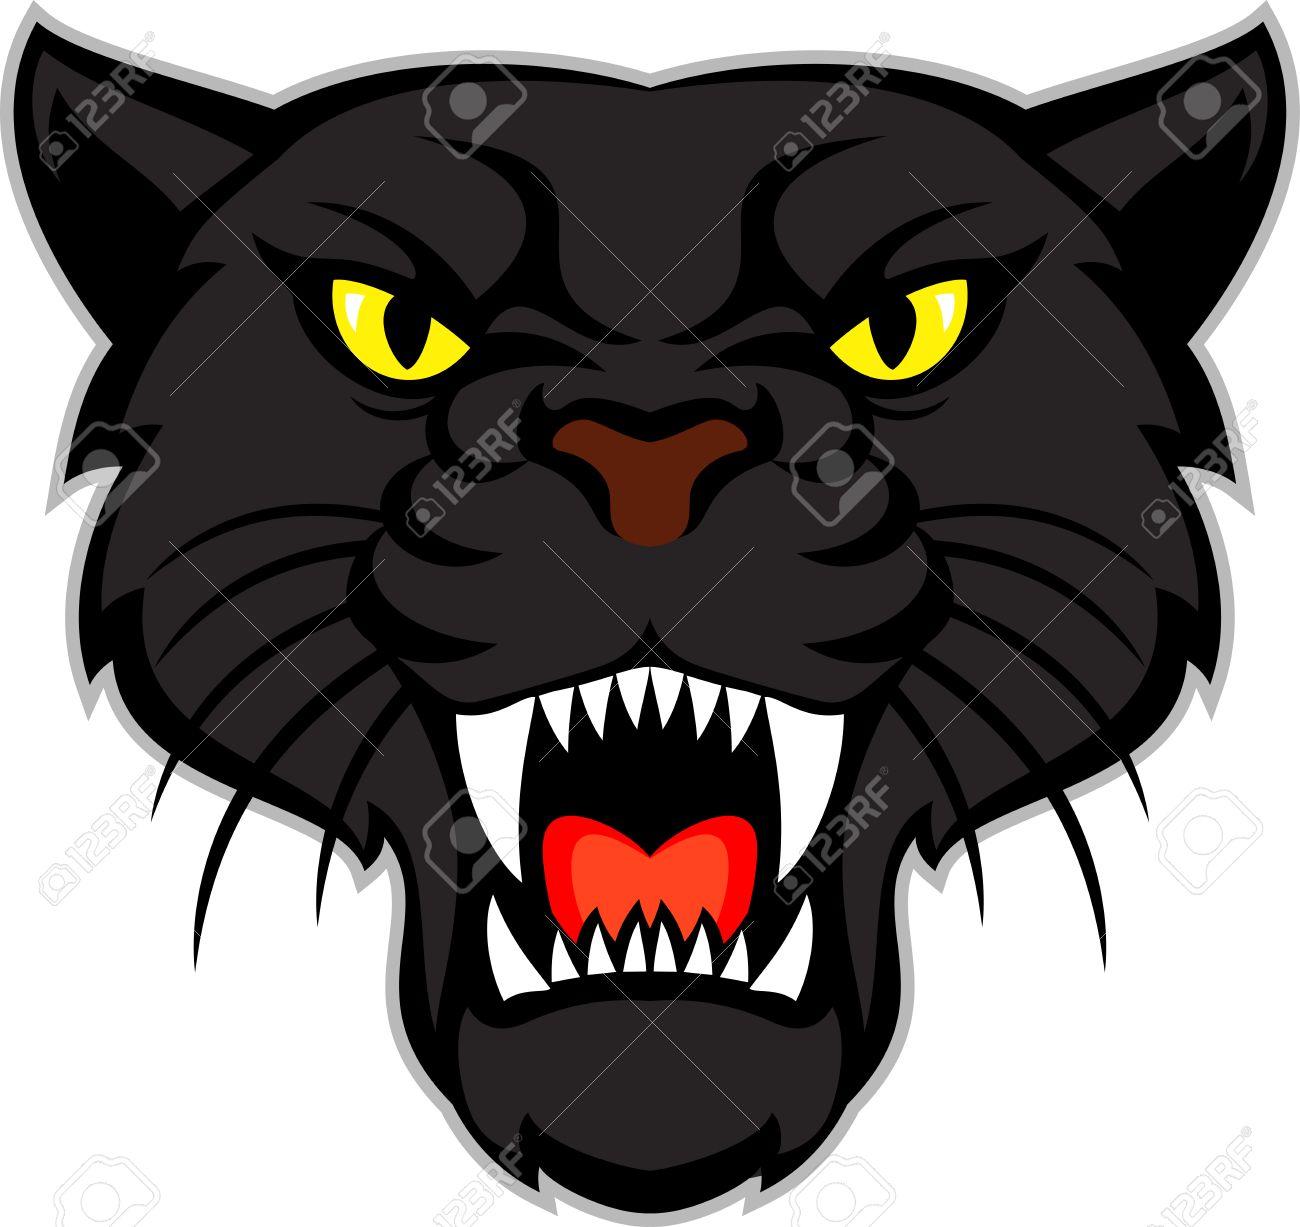 black panther head - 60988323